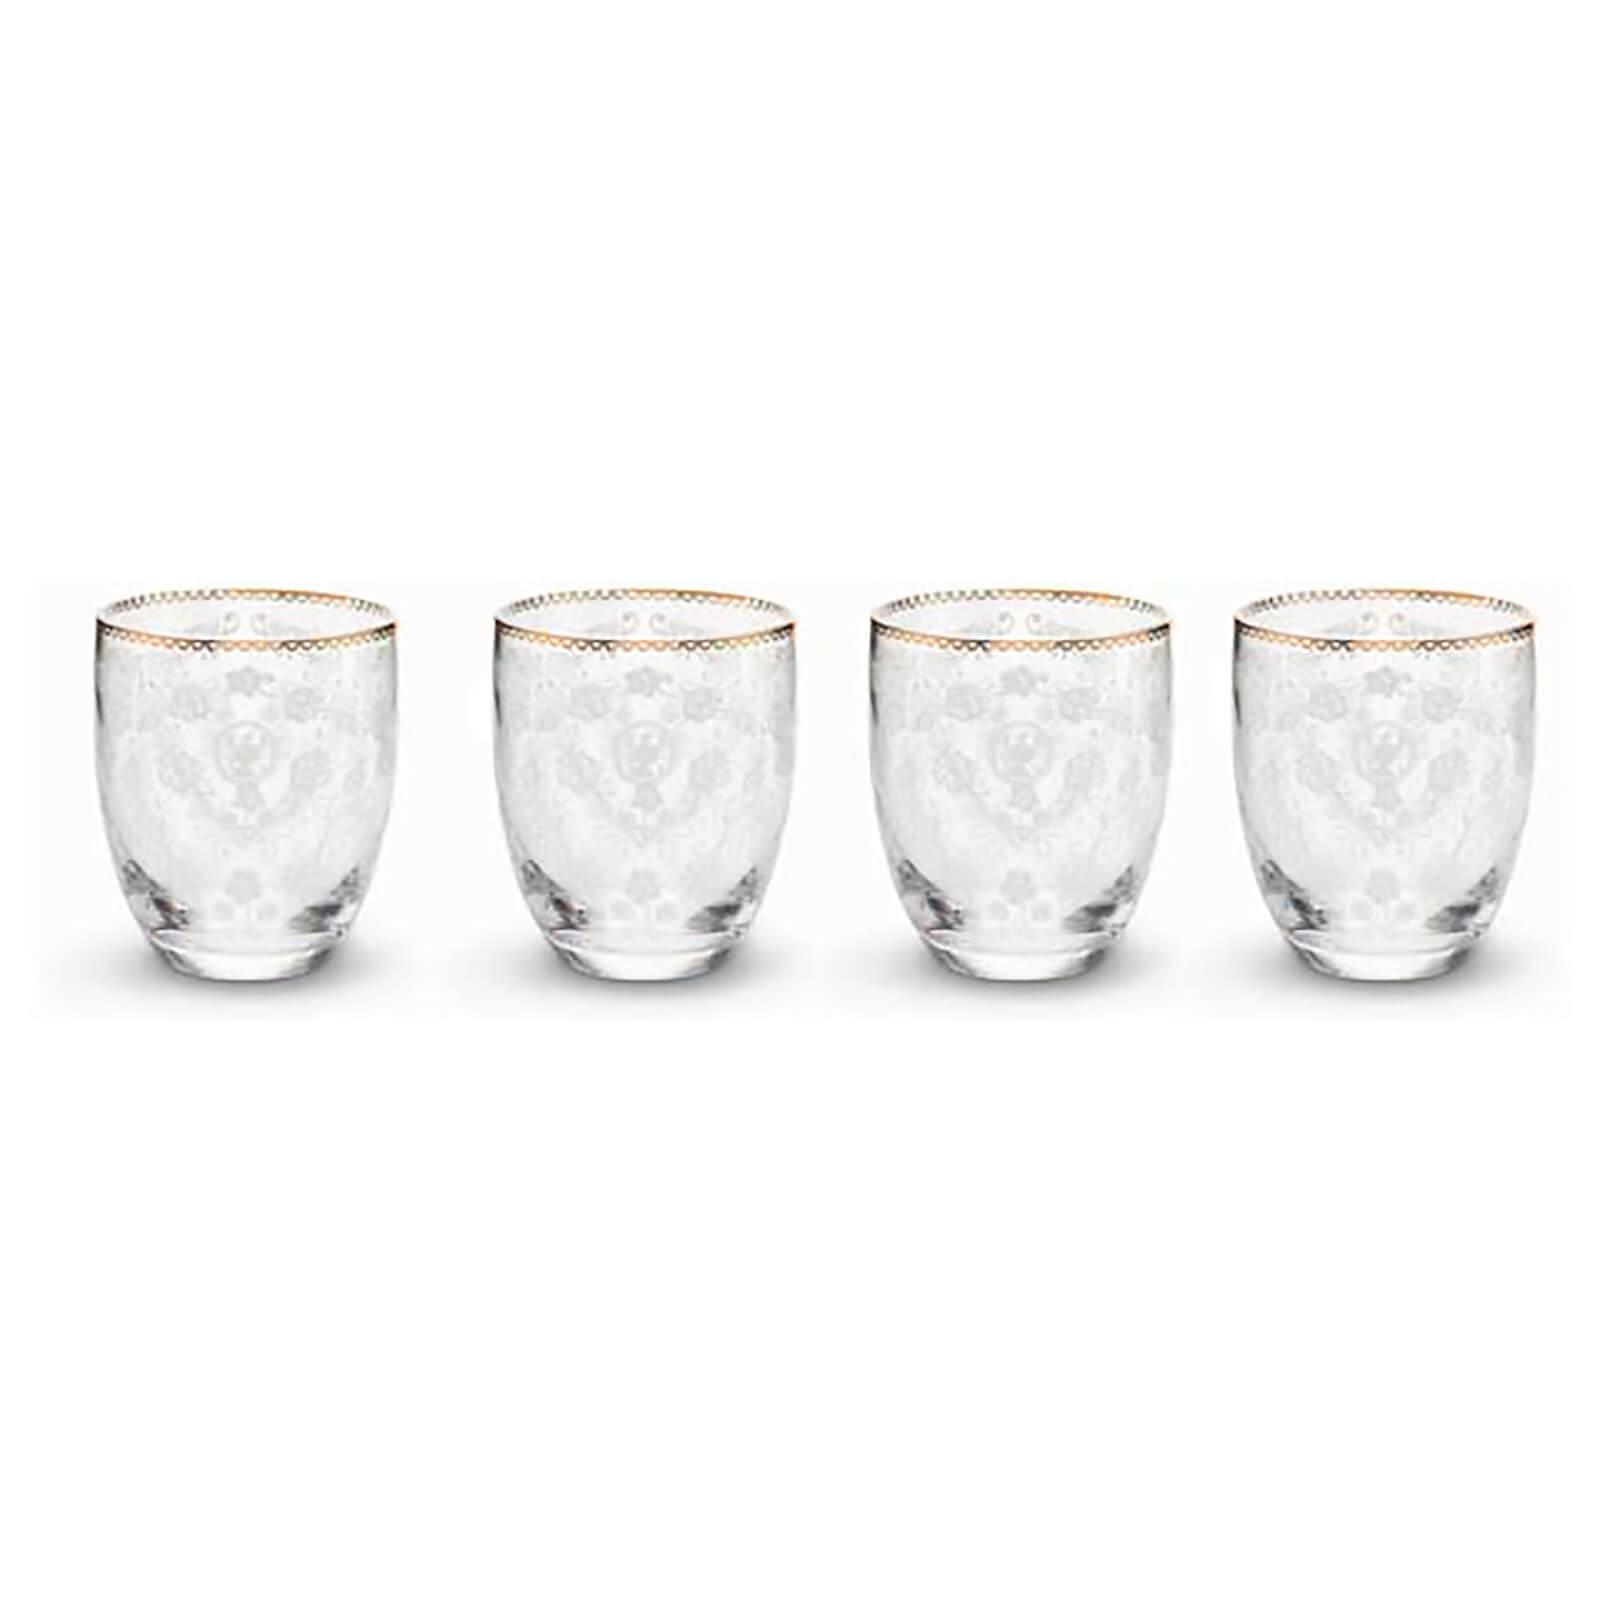 Pip Studio Water Glasses - Floral (Set of 4)